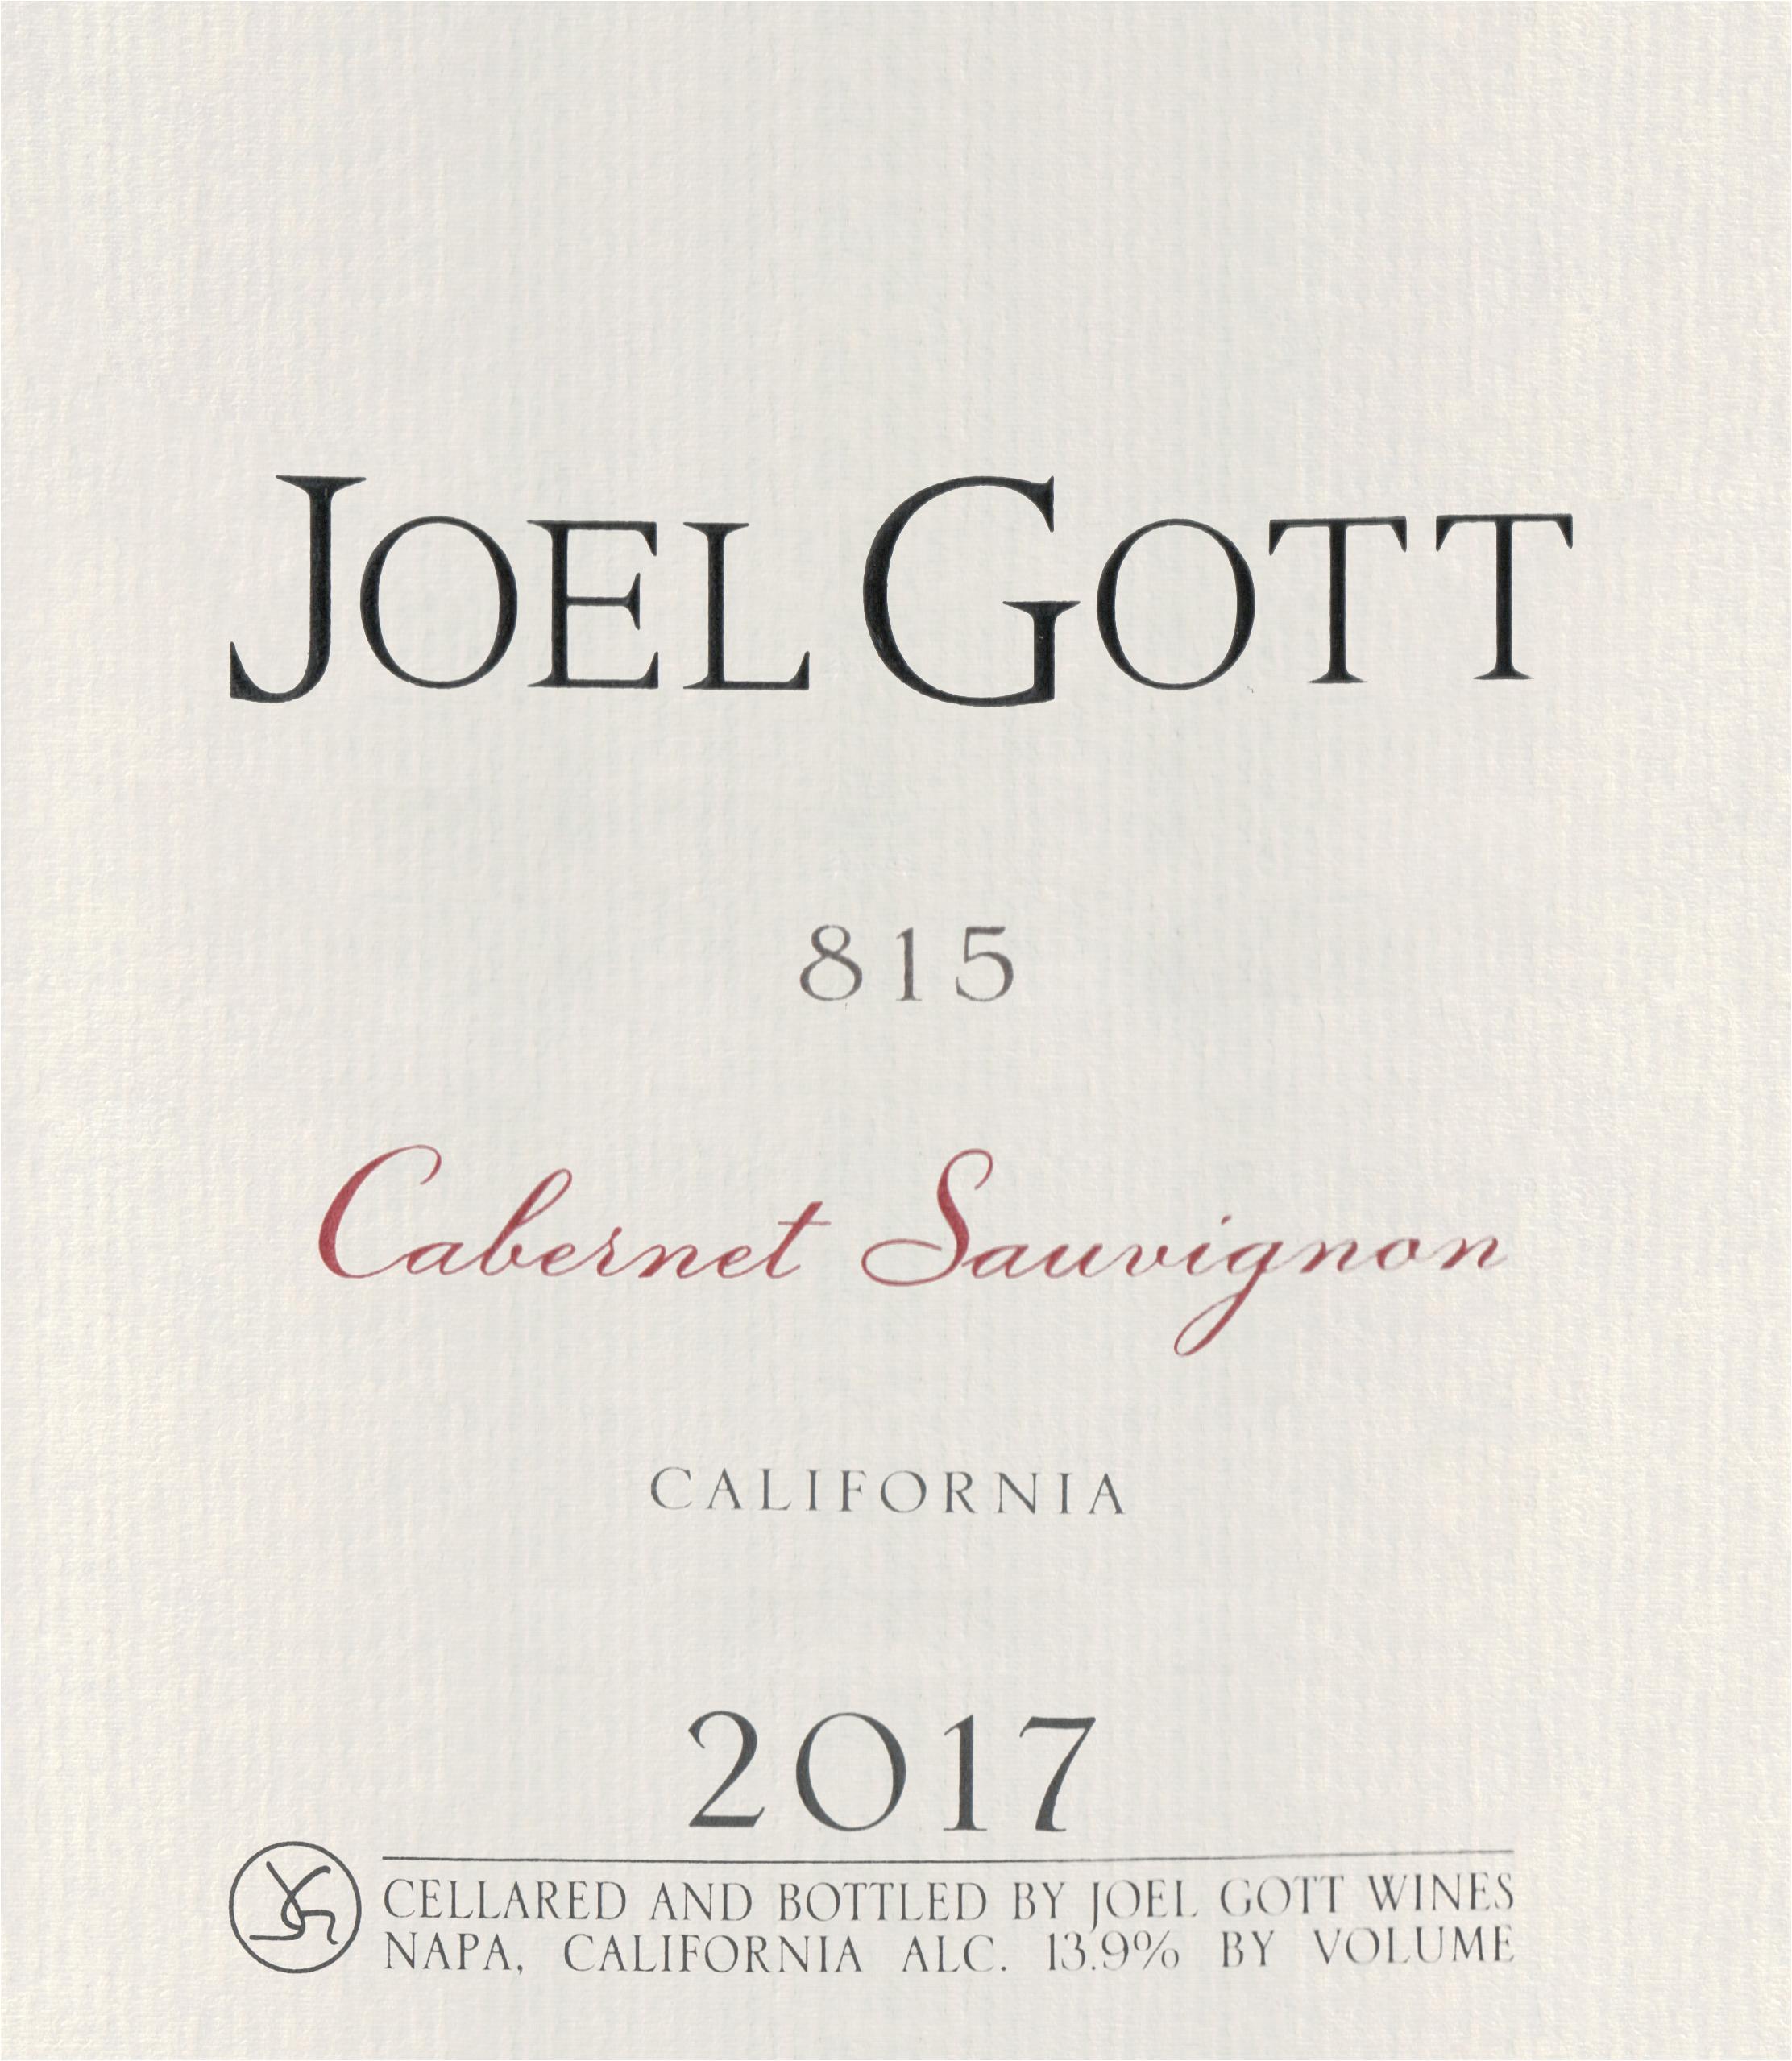 Joel Gott Cabernet Sauvignon 815 2017